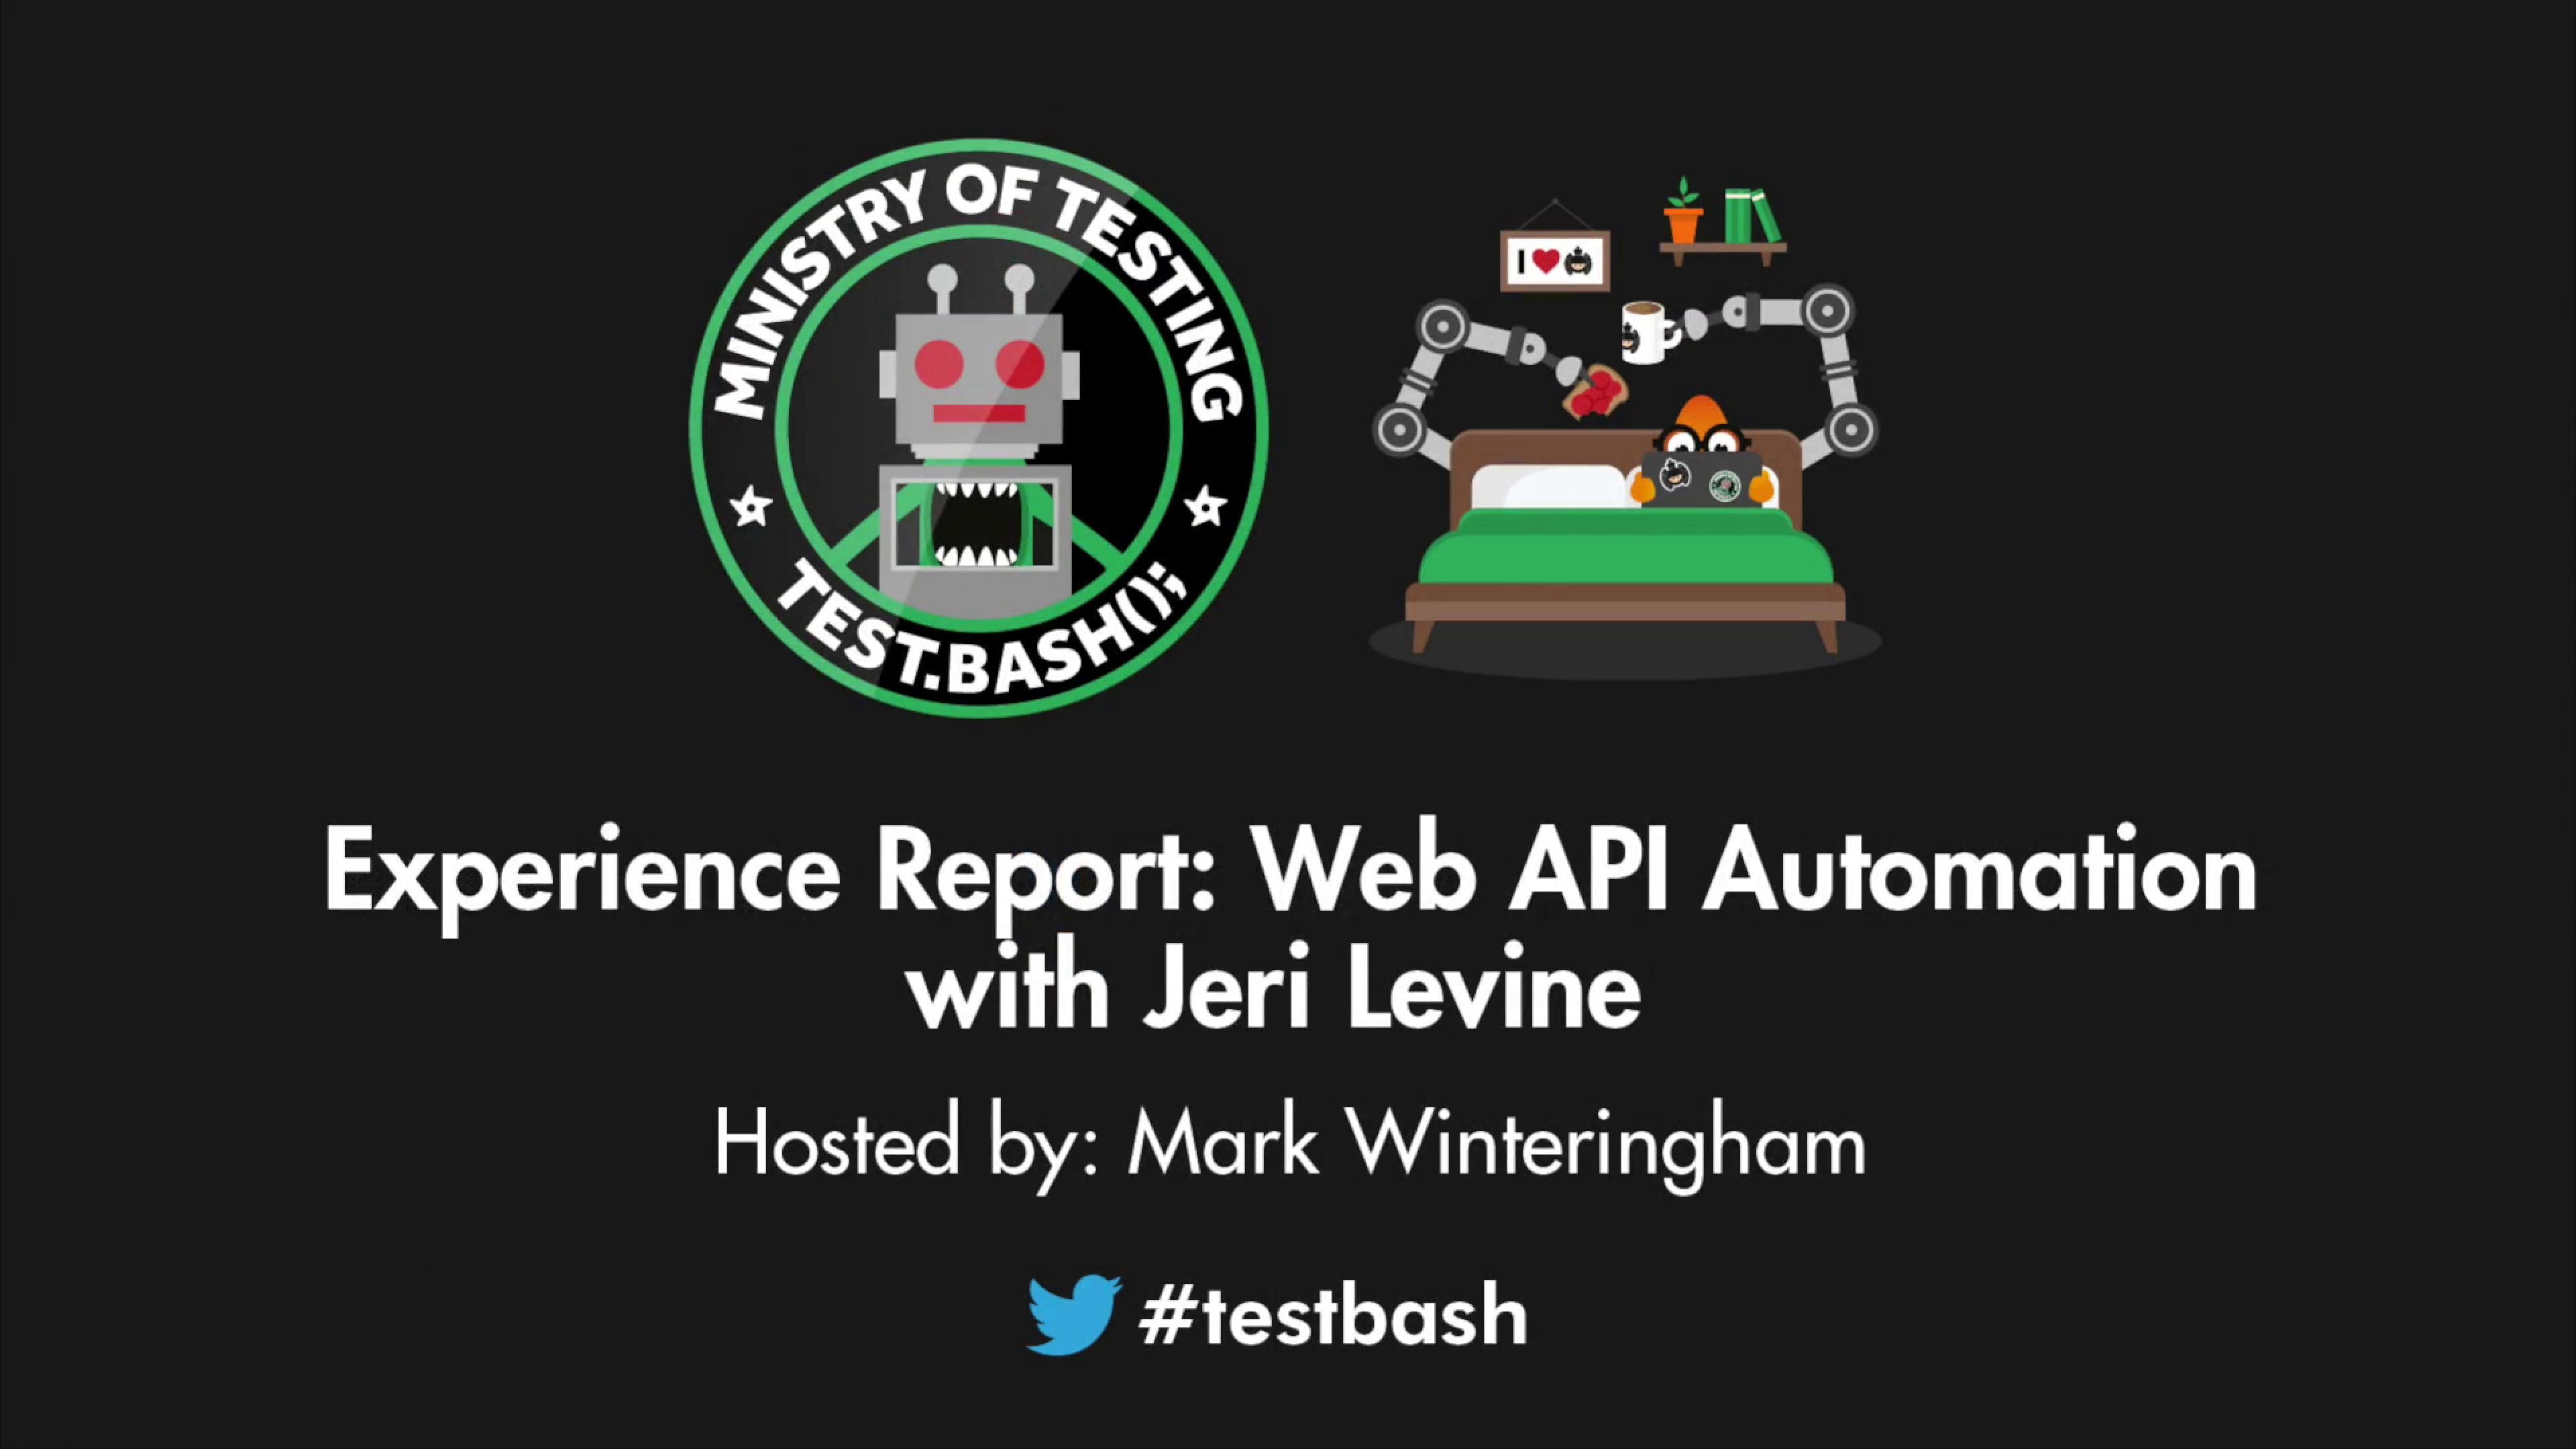 Experience Report: Web API Automation - Jeri Levine